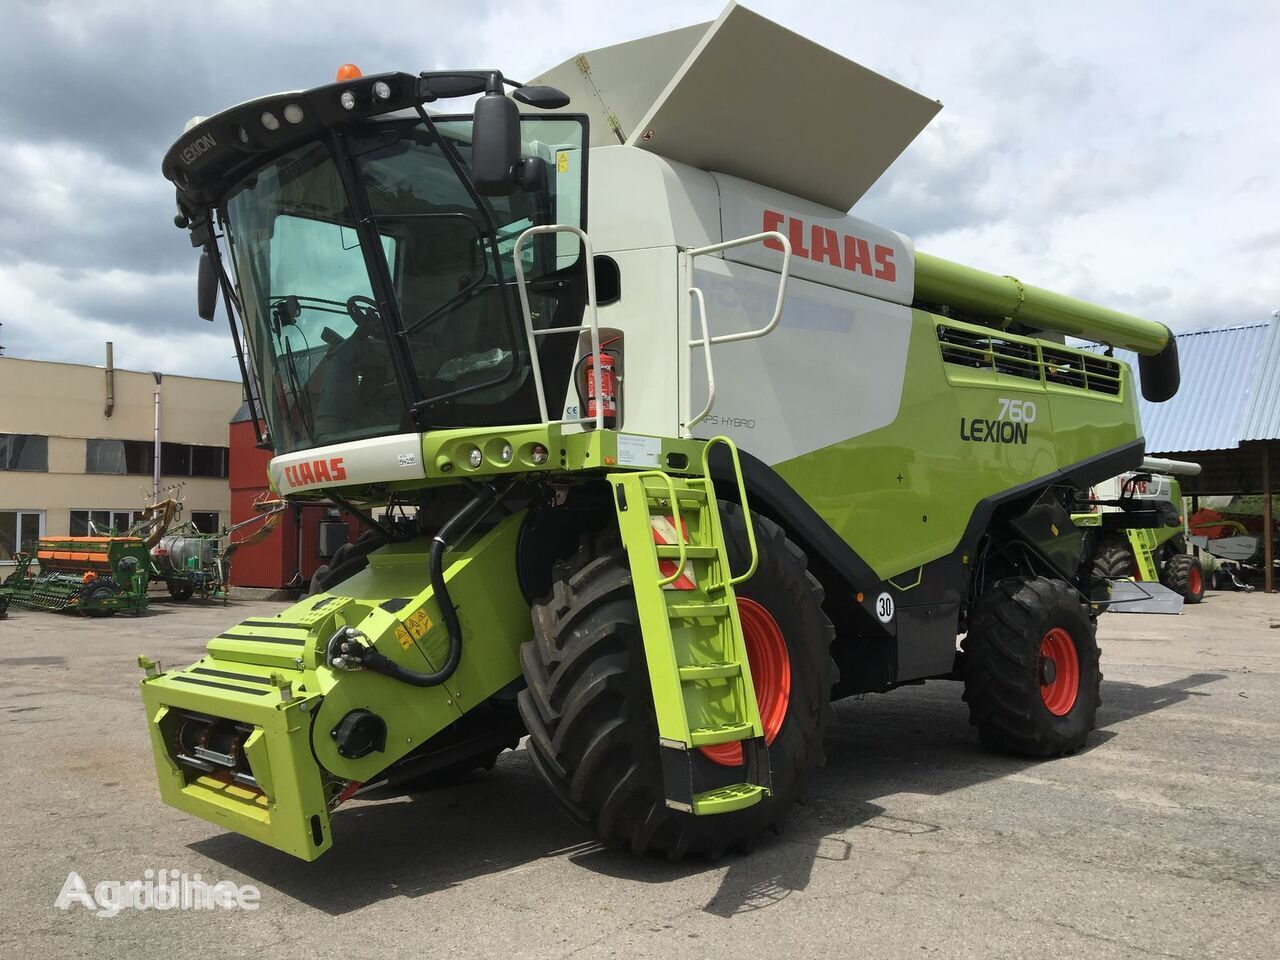 CLAAS Lexion 760 v Lizing grain harvester